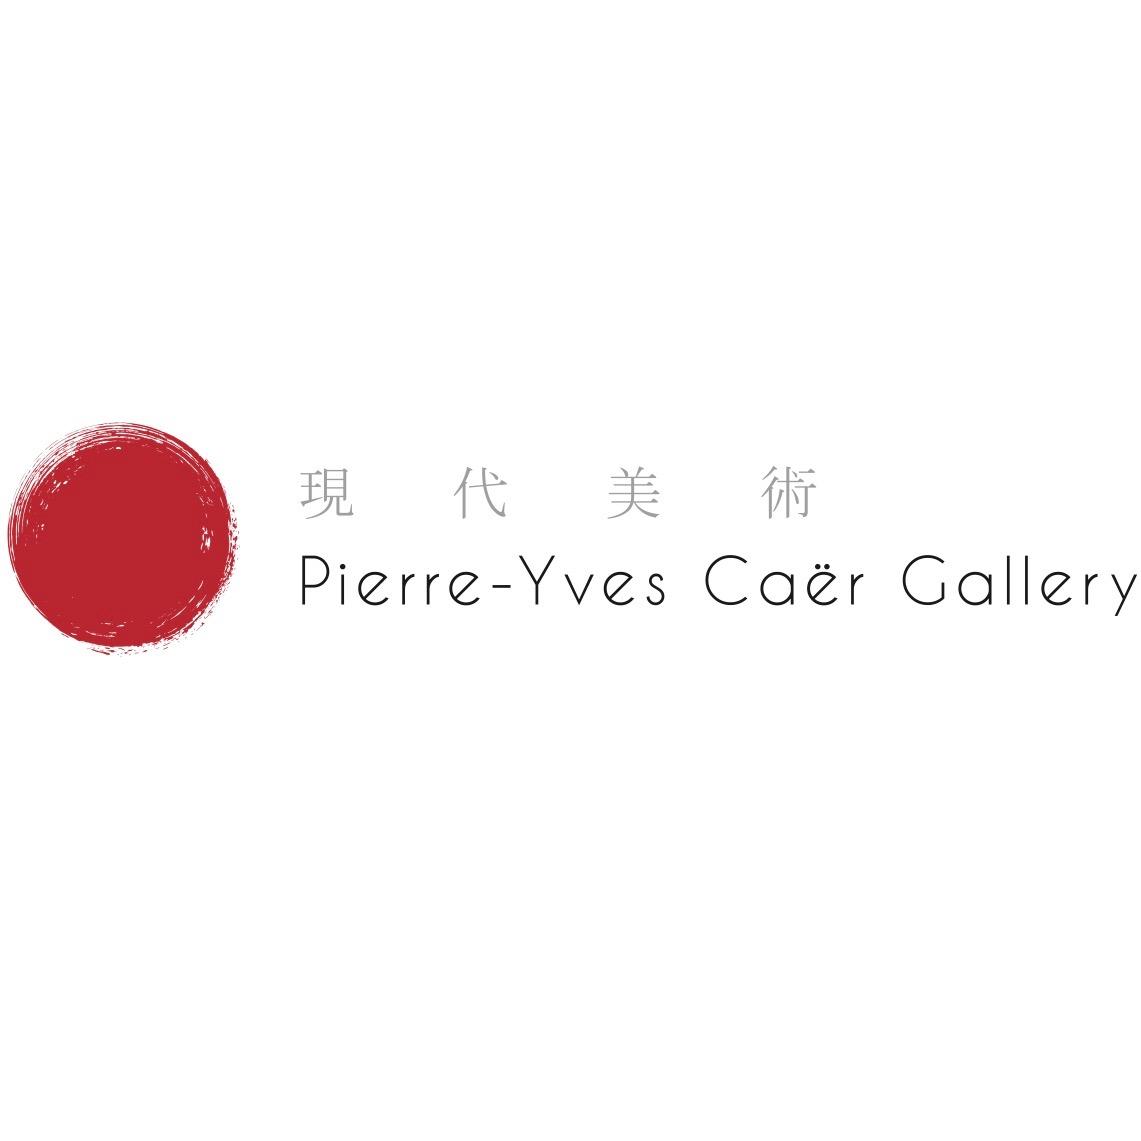 Pierre-Yves Caër Gallery